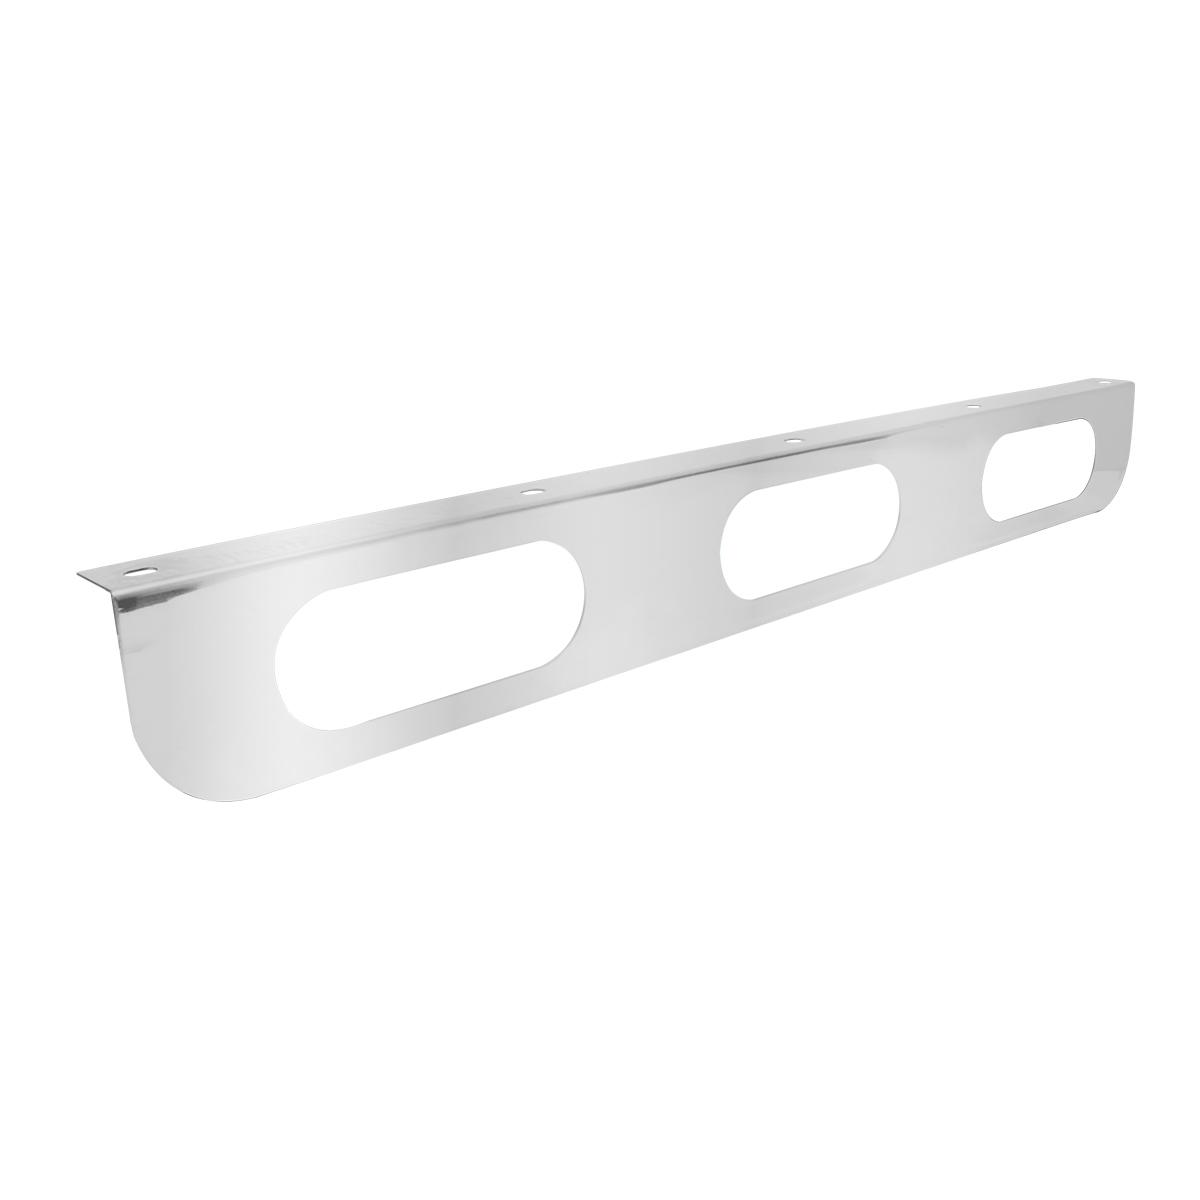 "Stainless Steel Triple Light ""L"" Shape 33 ¼"" Long Mounting Bracket Only"